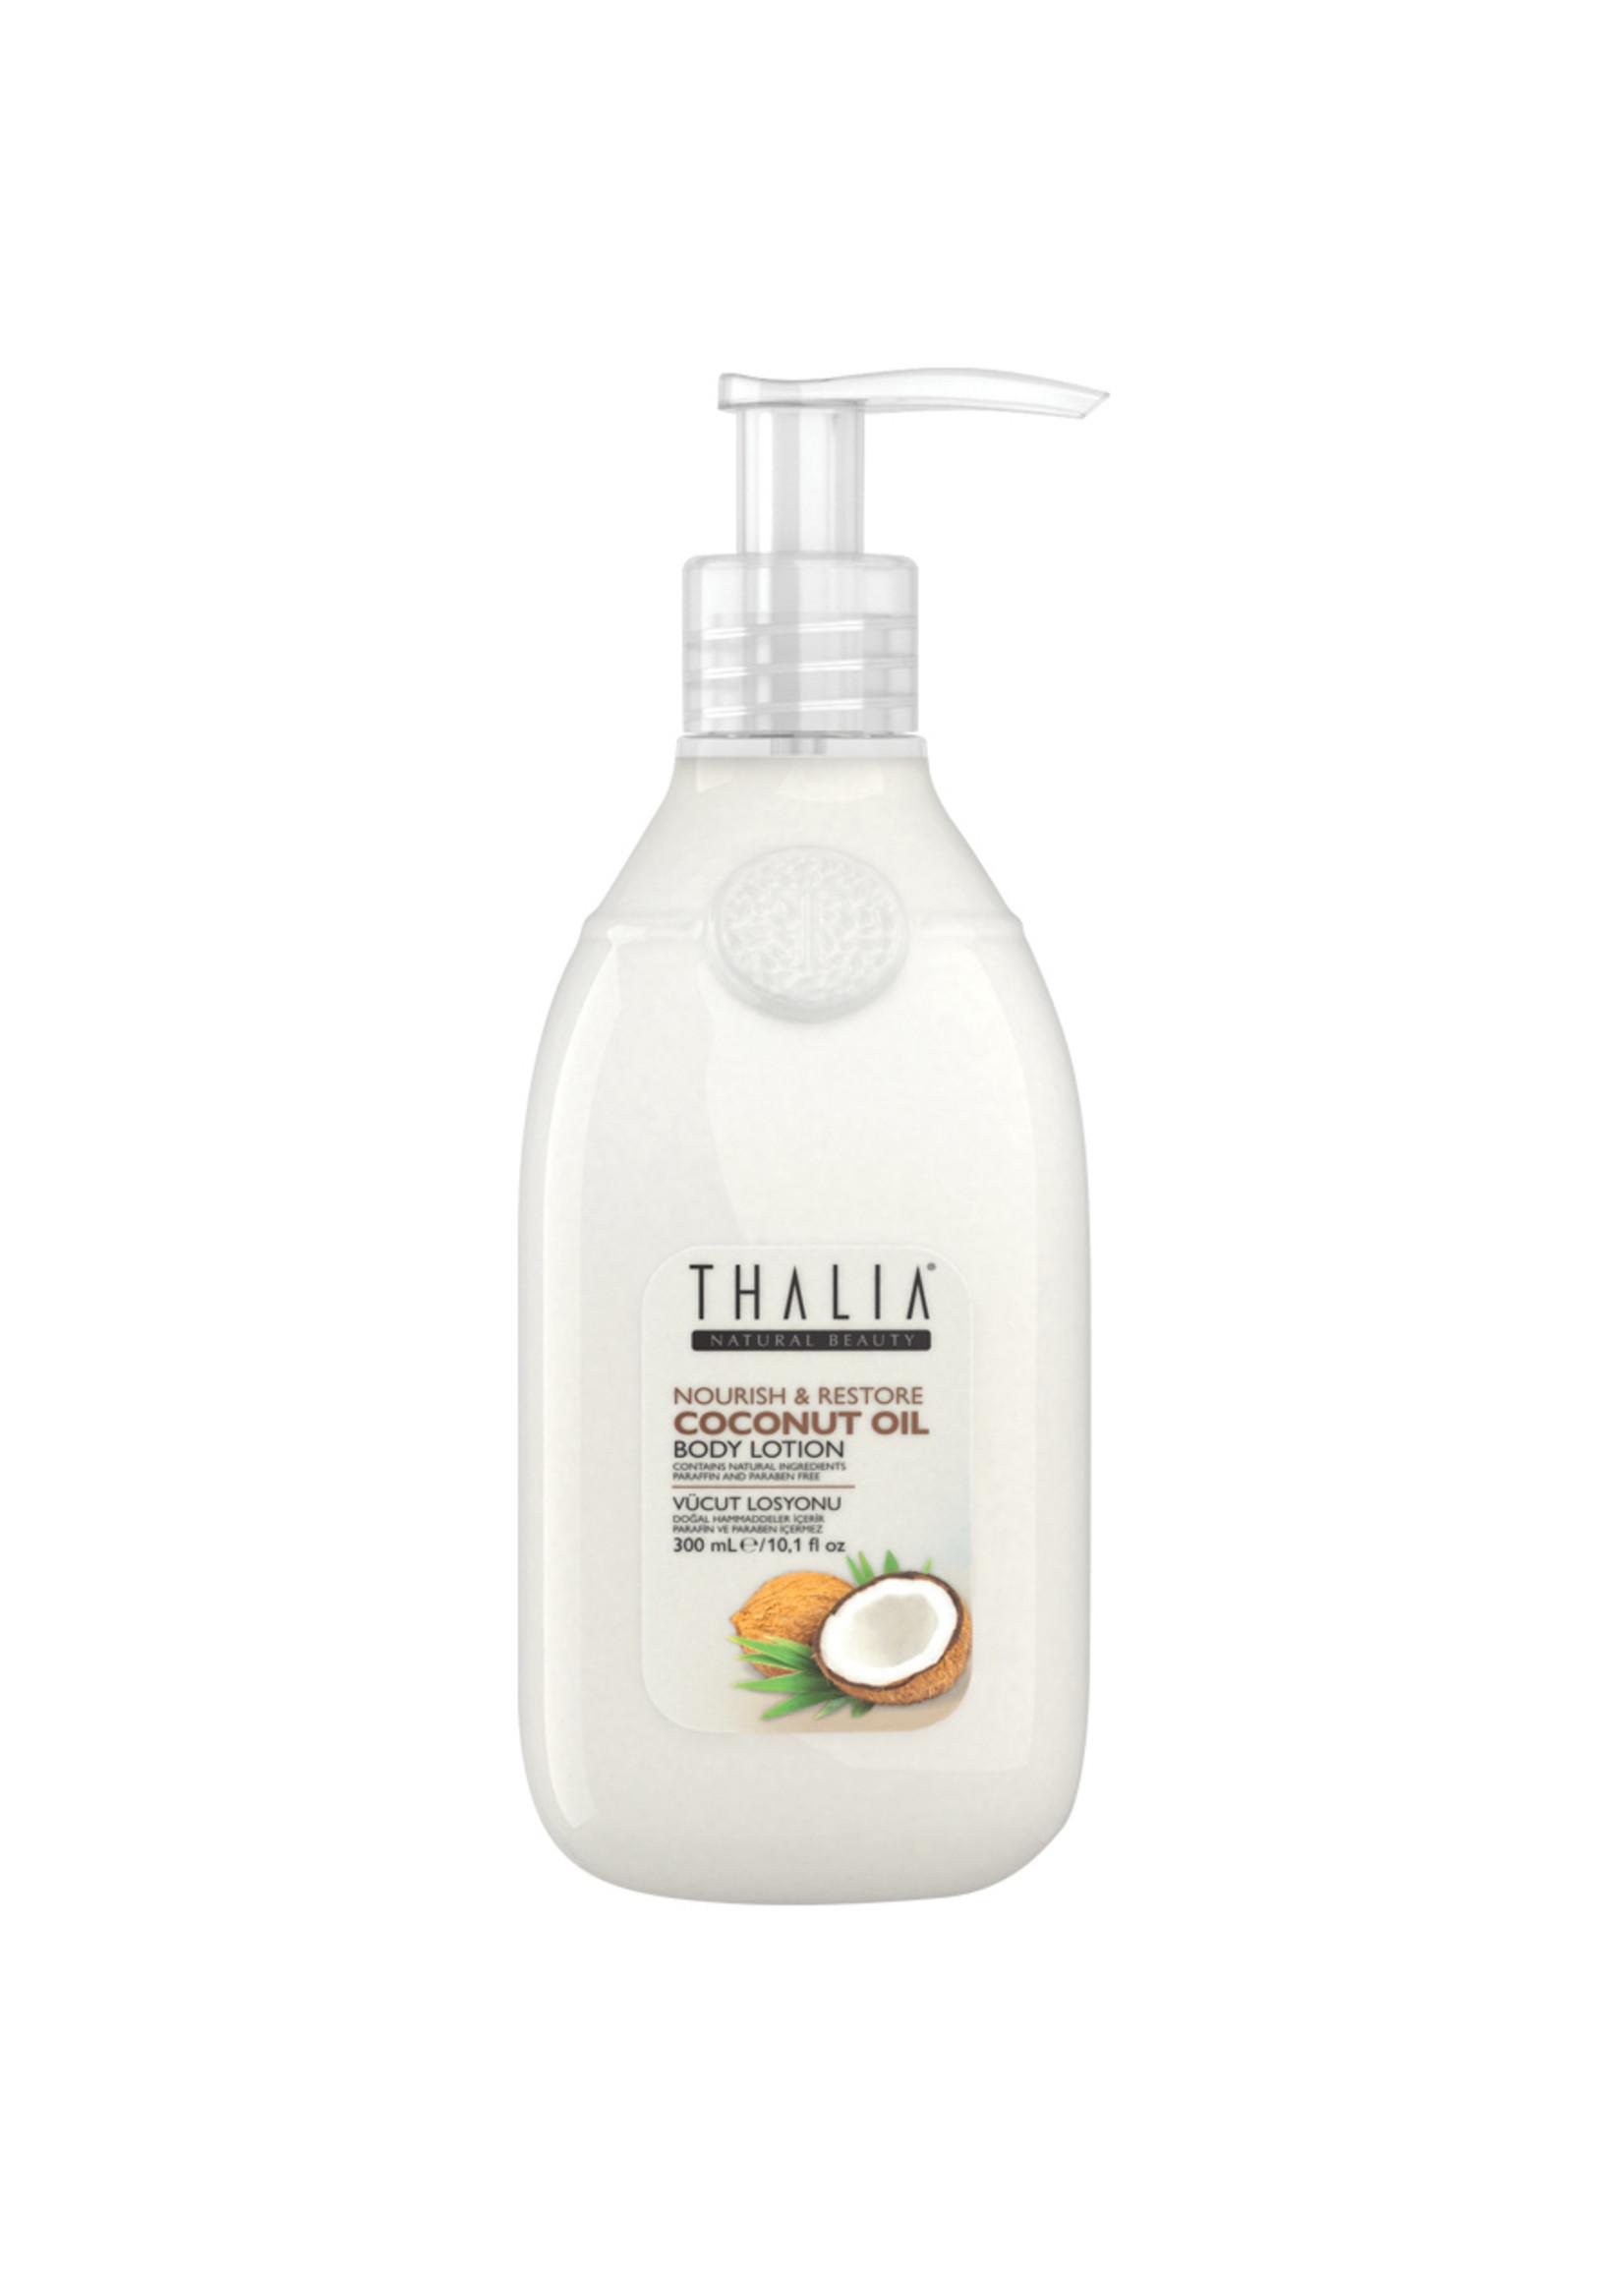 Thalia Coconut Oil Vücut Bakım Losyonu - 300 ml